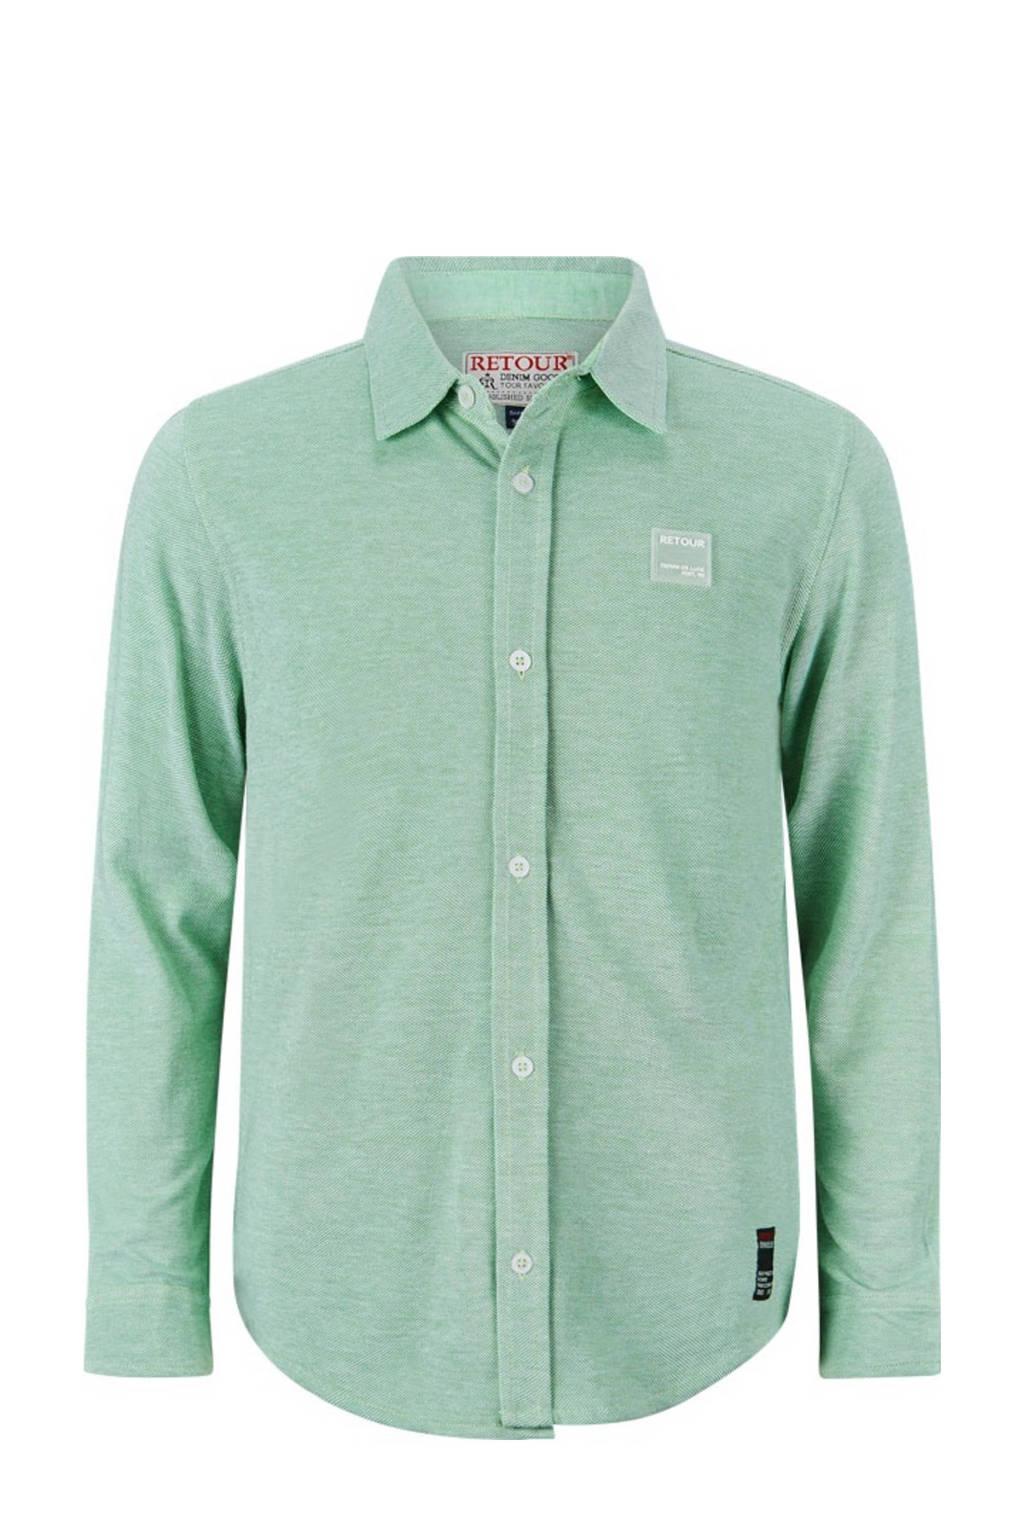 Retour Denim overhemd Keith helder groen, Helder groen